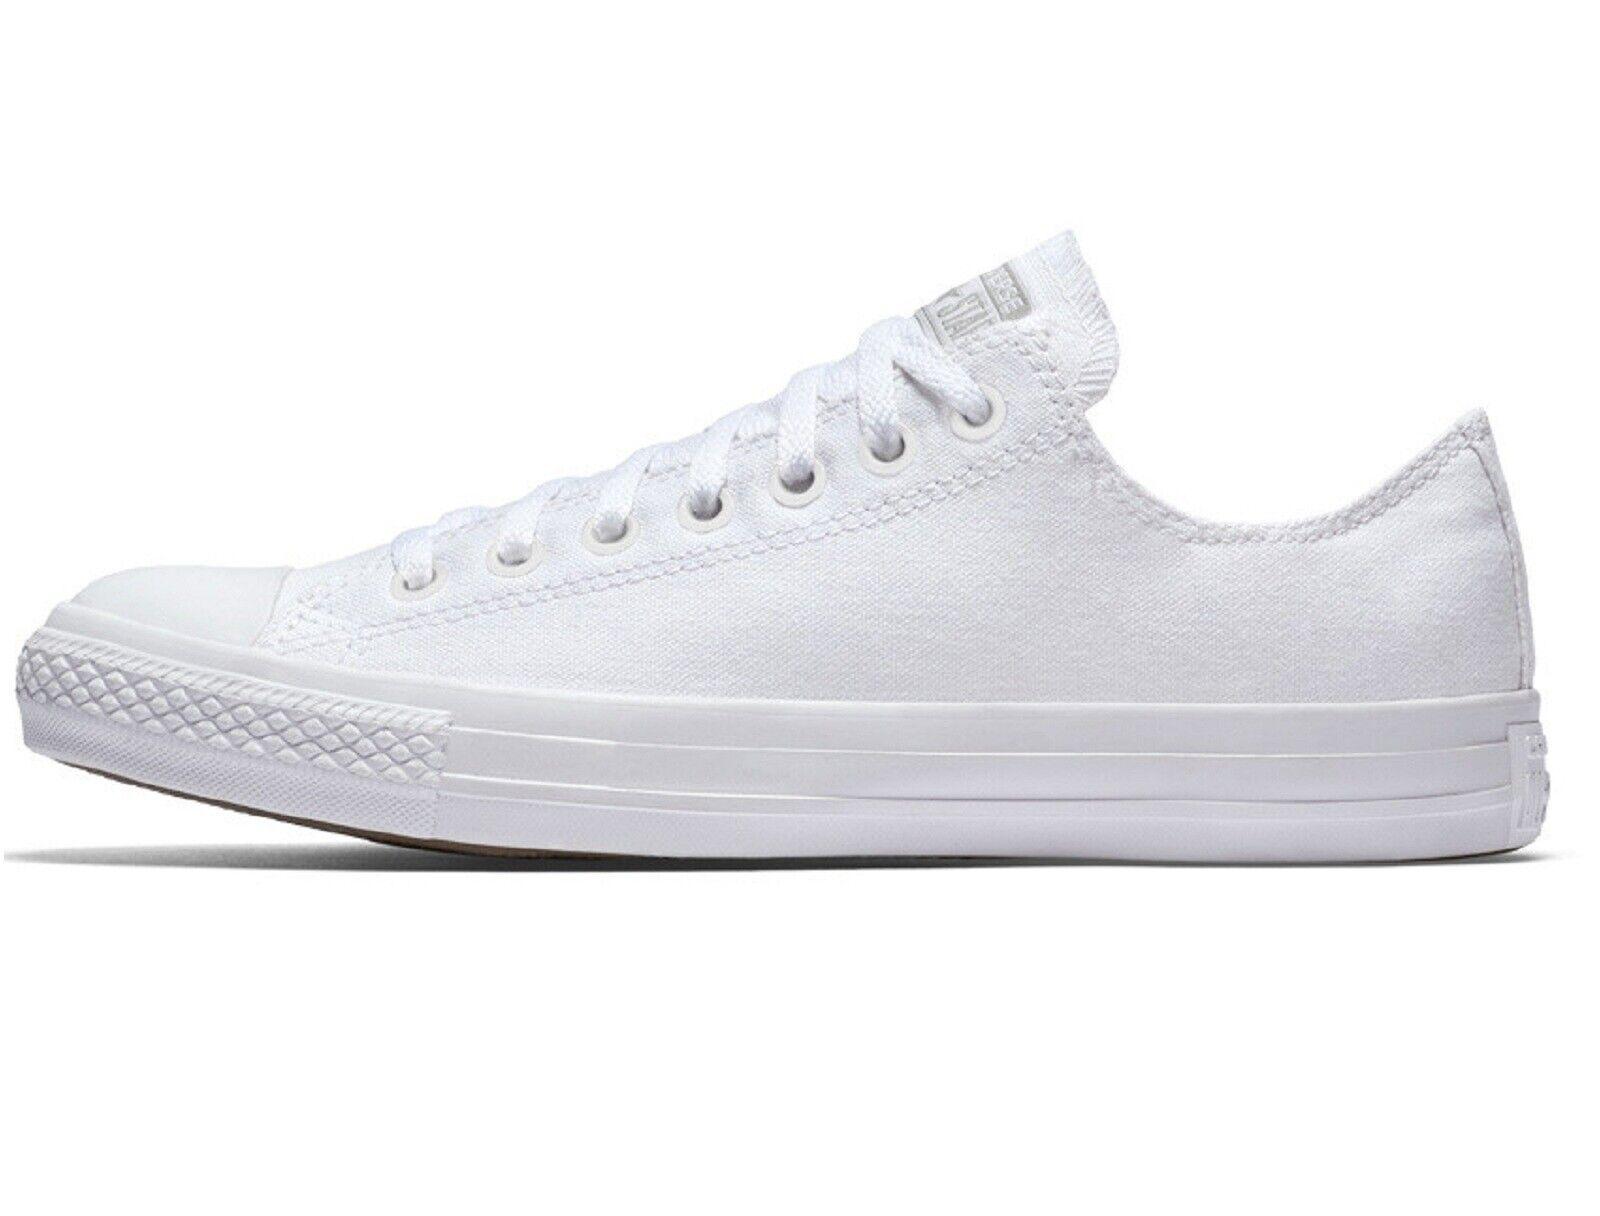 CONVERSE CTAS Sp Ox blanc Bianco 1U647 Unisex baskets